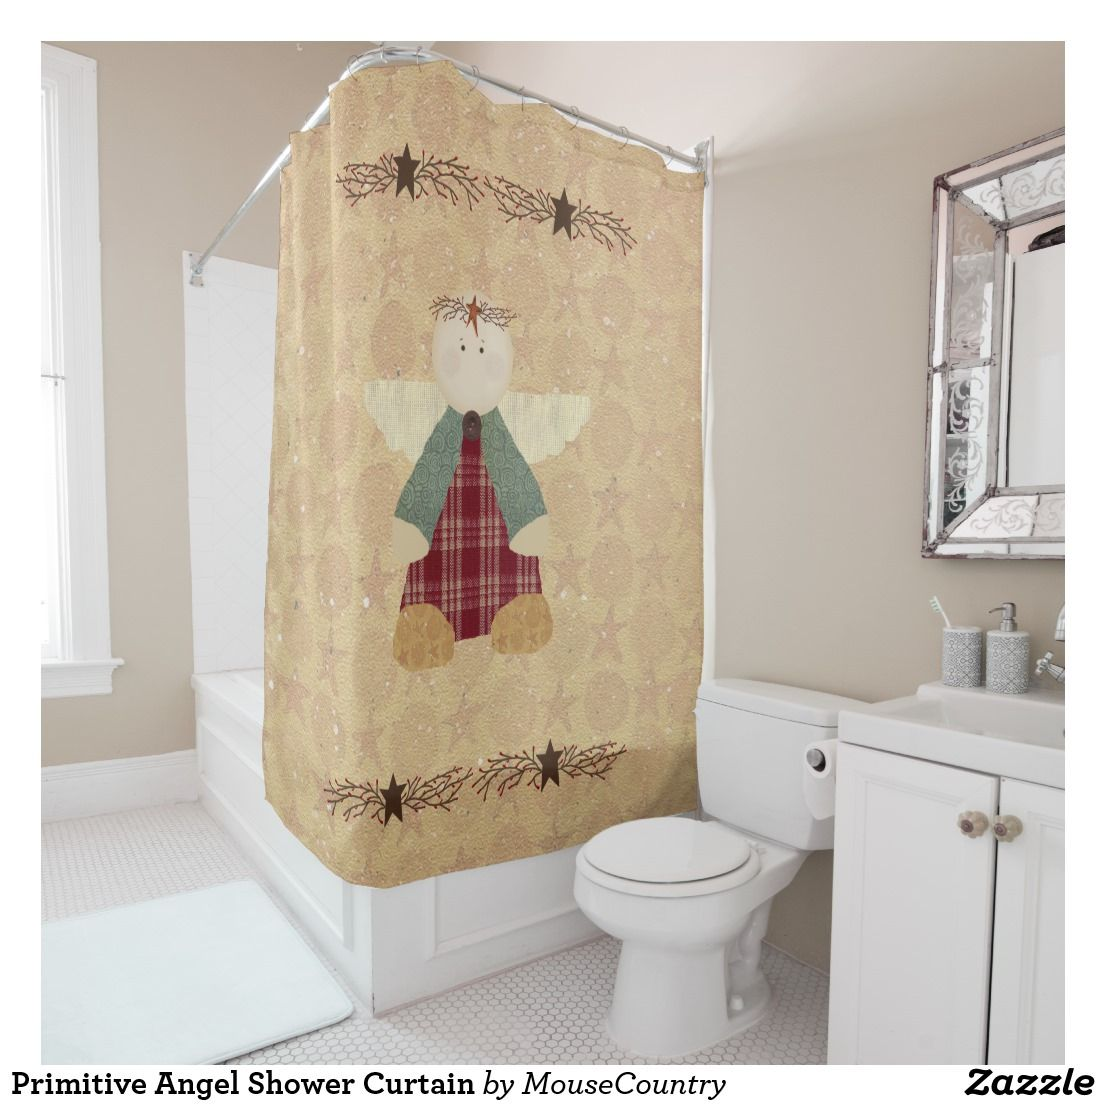 Primitive Angel Shower Curtain